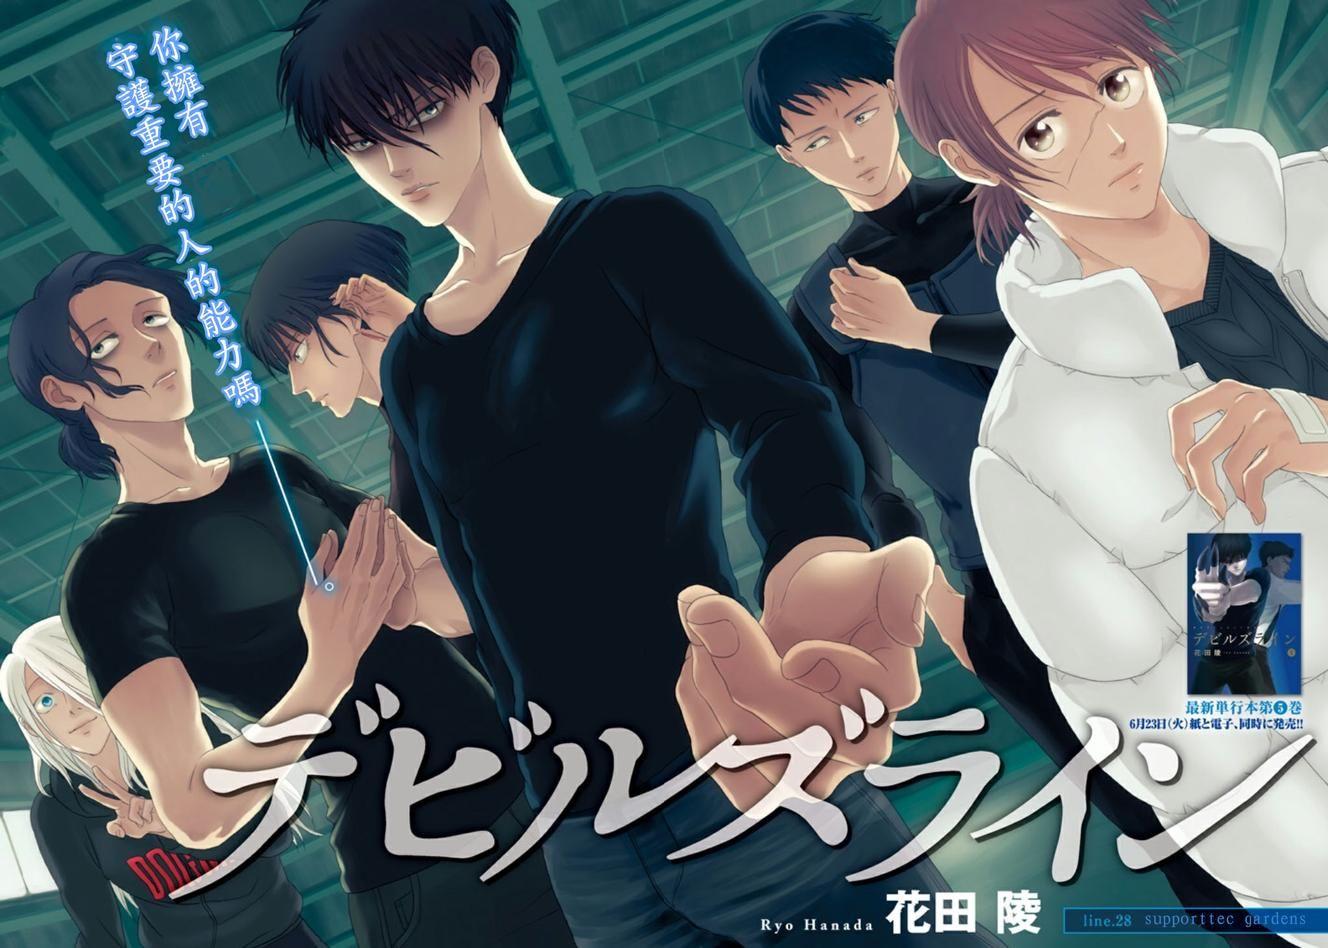 devils line anime manga